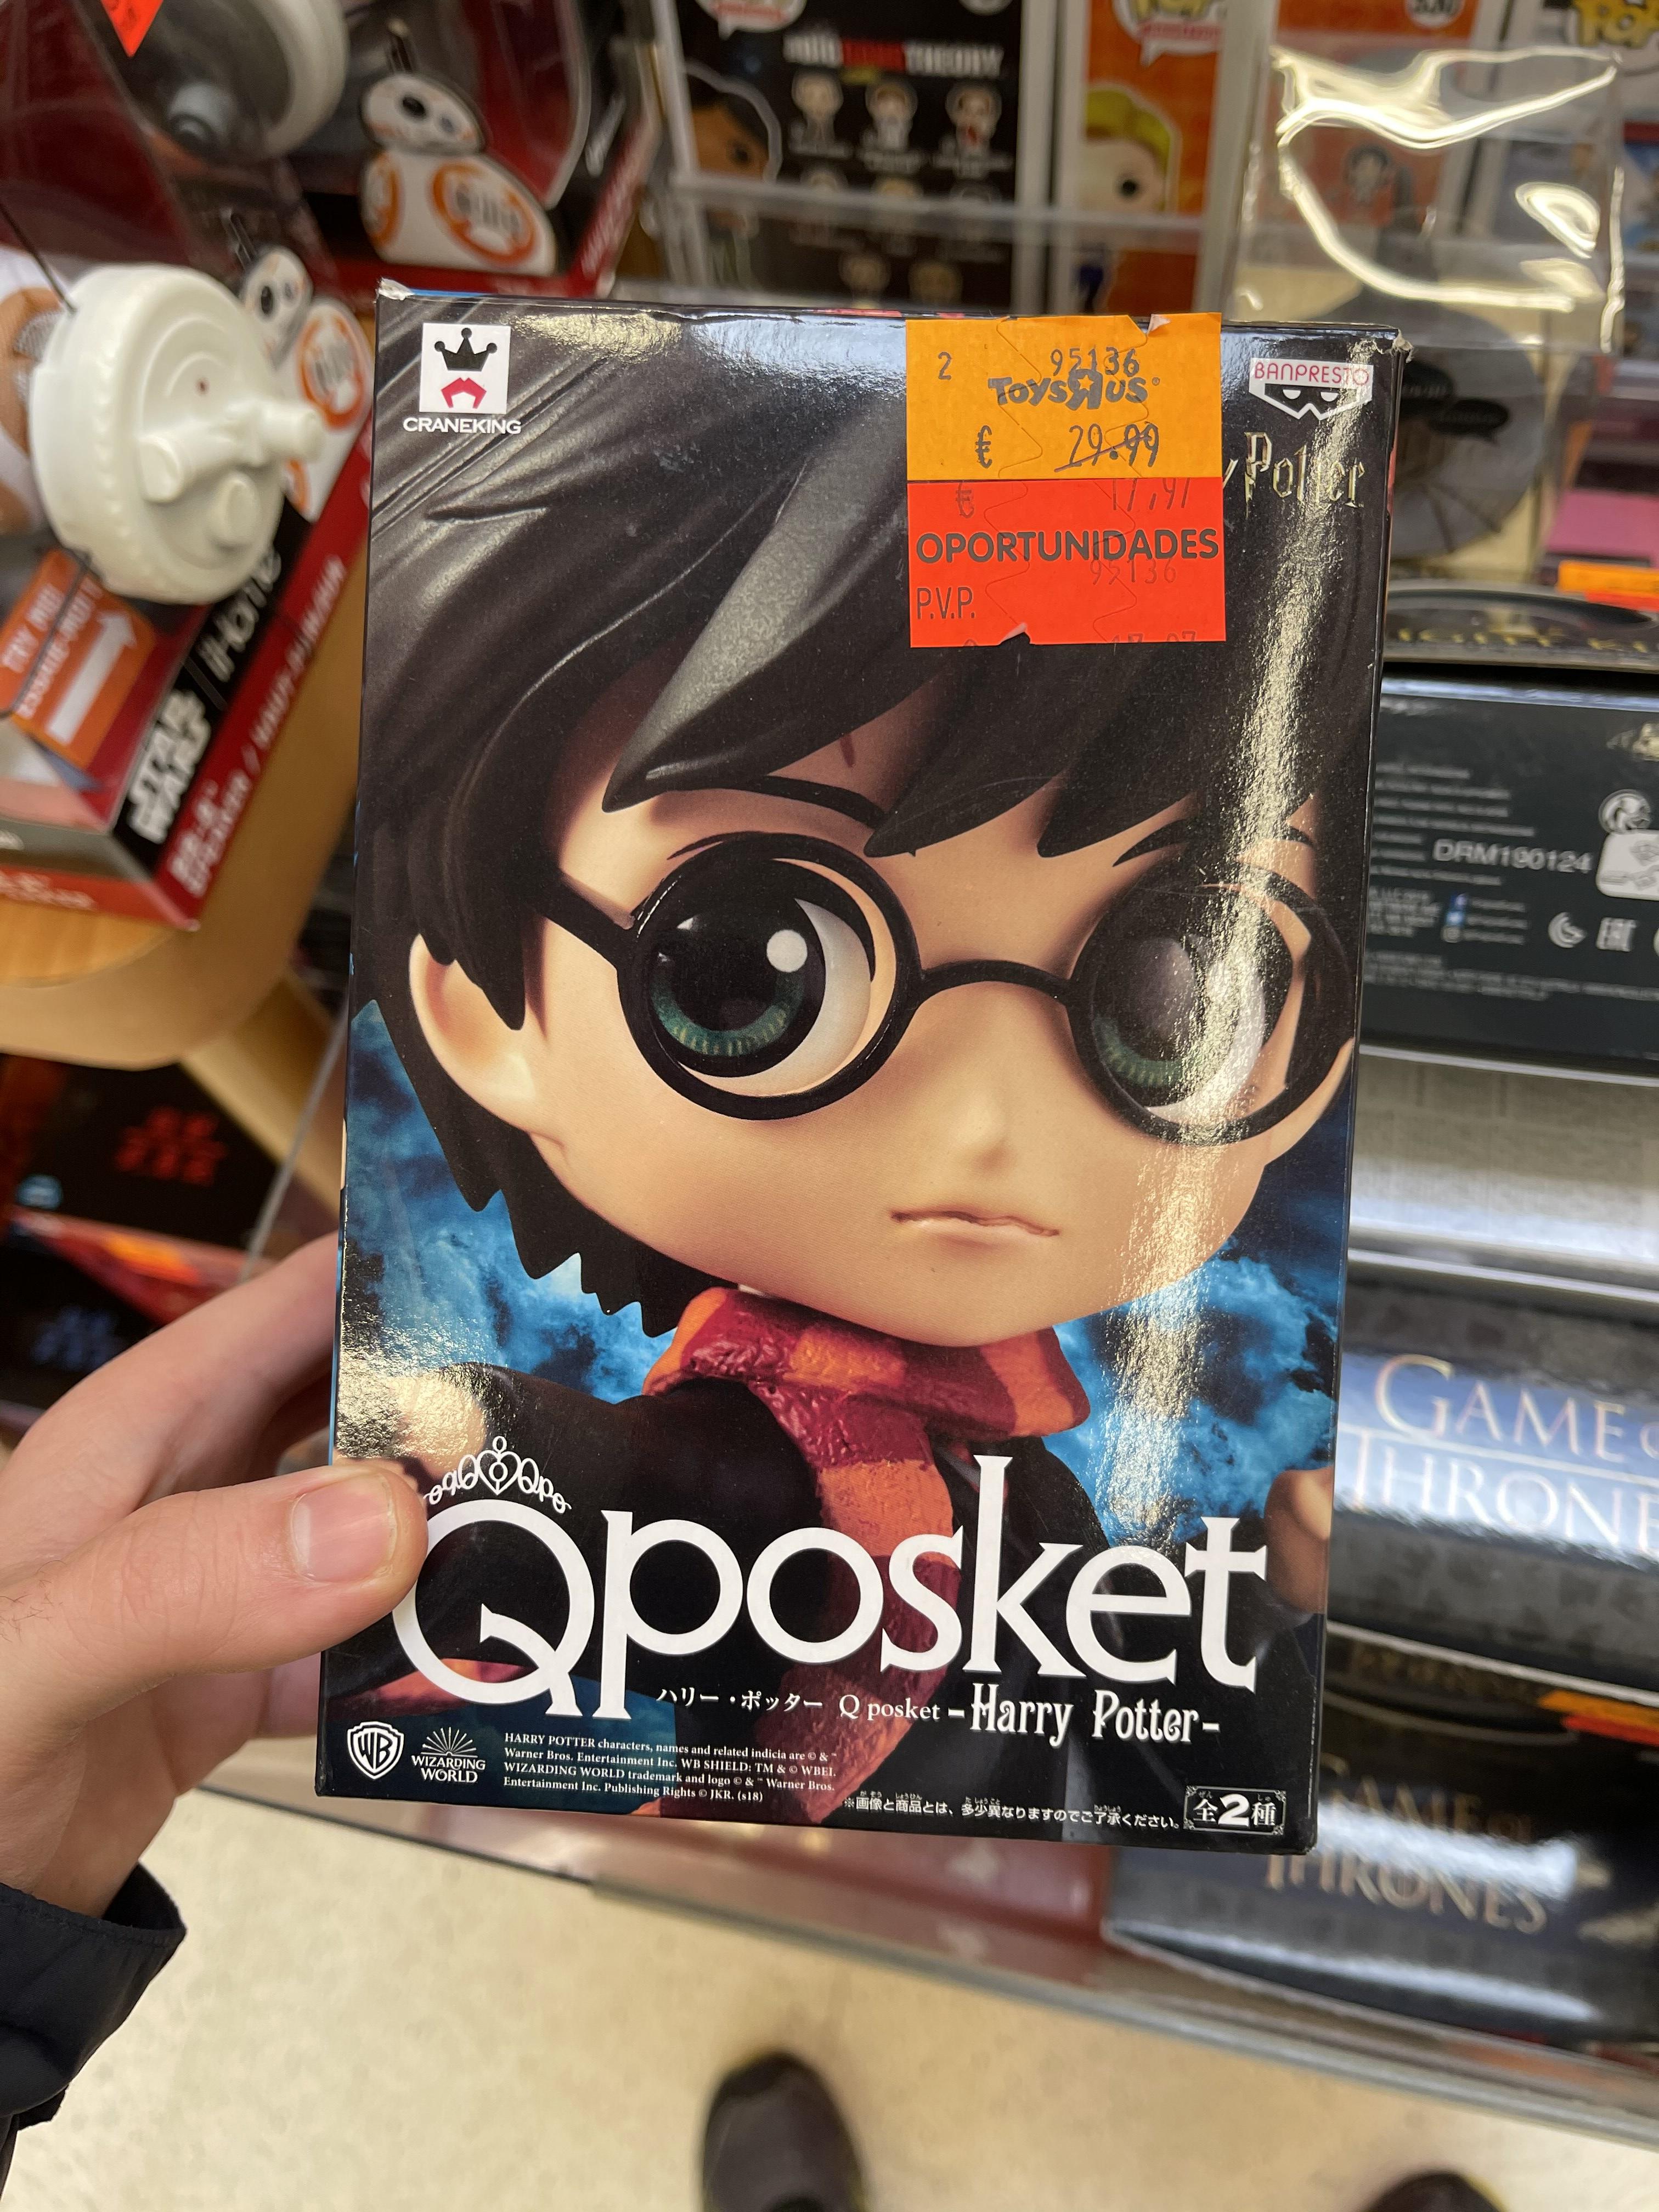 Figura QPosket, Harry Potter (Toys R' Us, Atalayas Murcia)